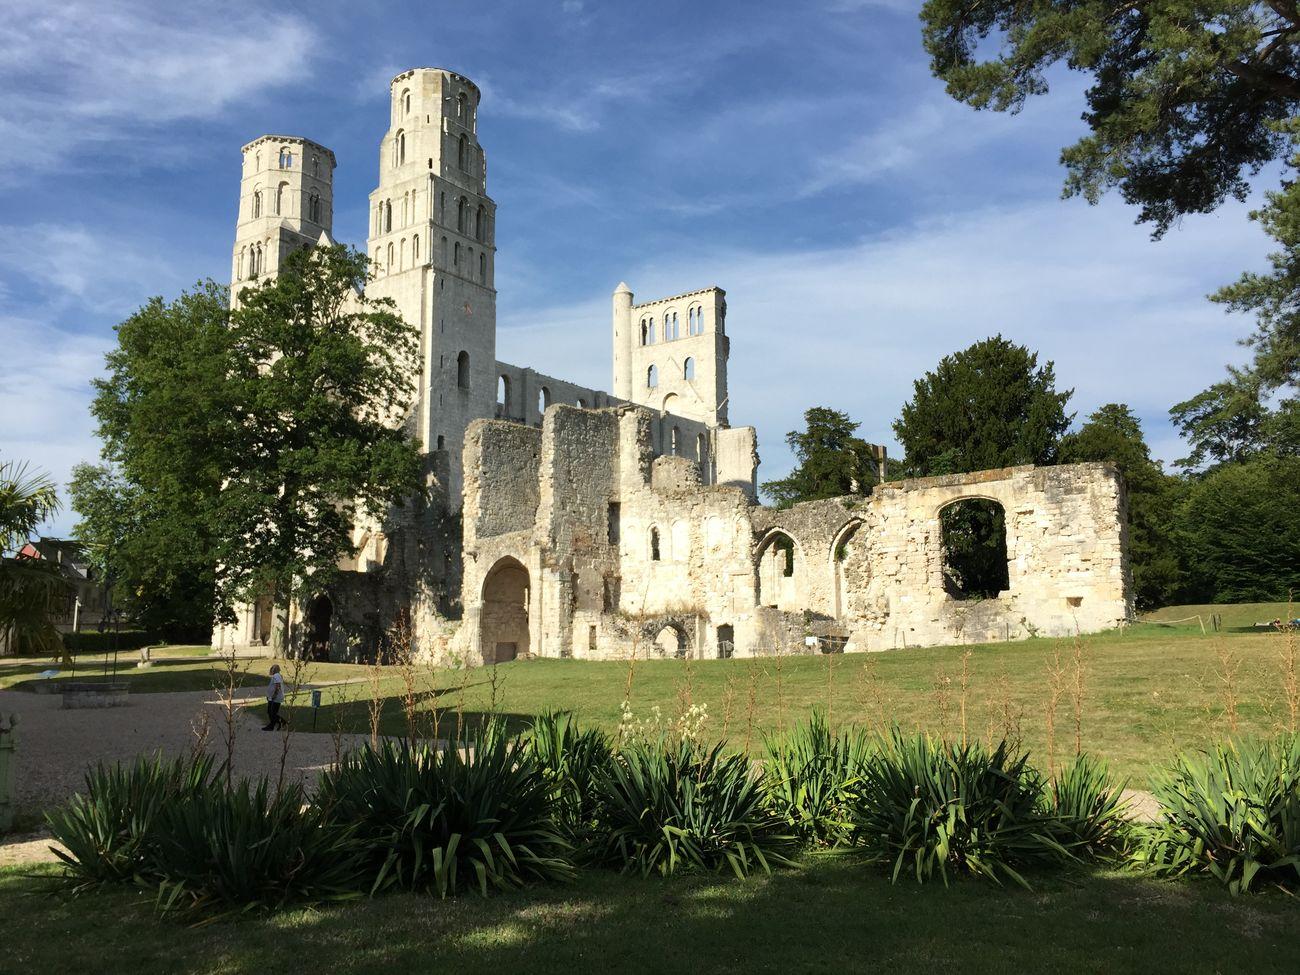 L'Abbaye le 2 Août 2015 Normandie France